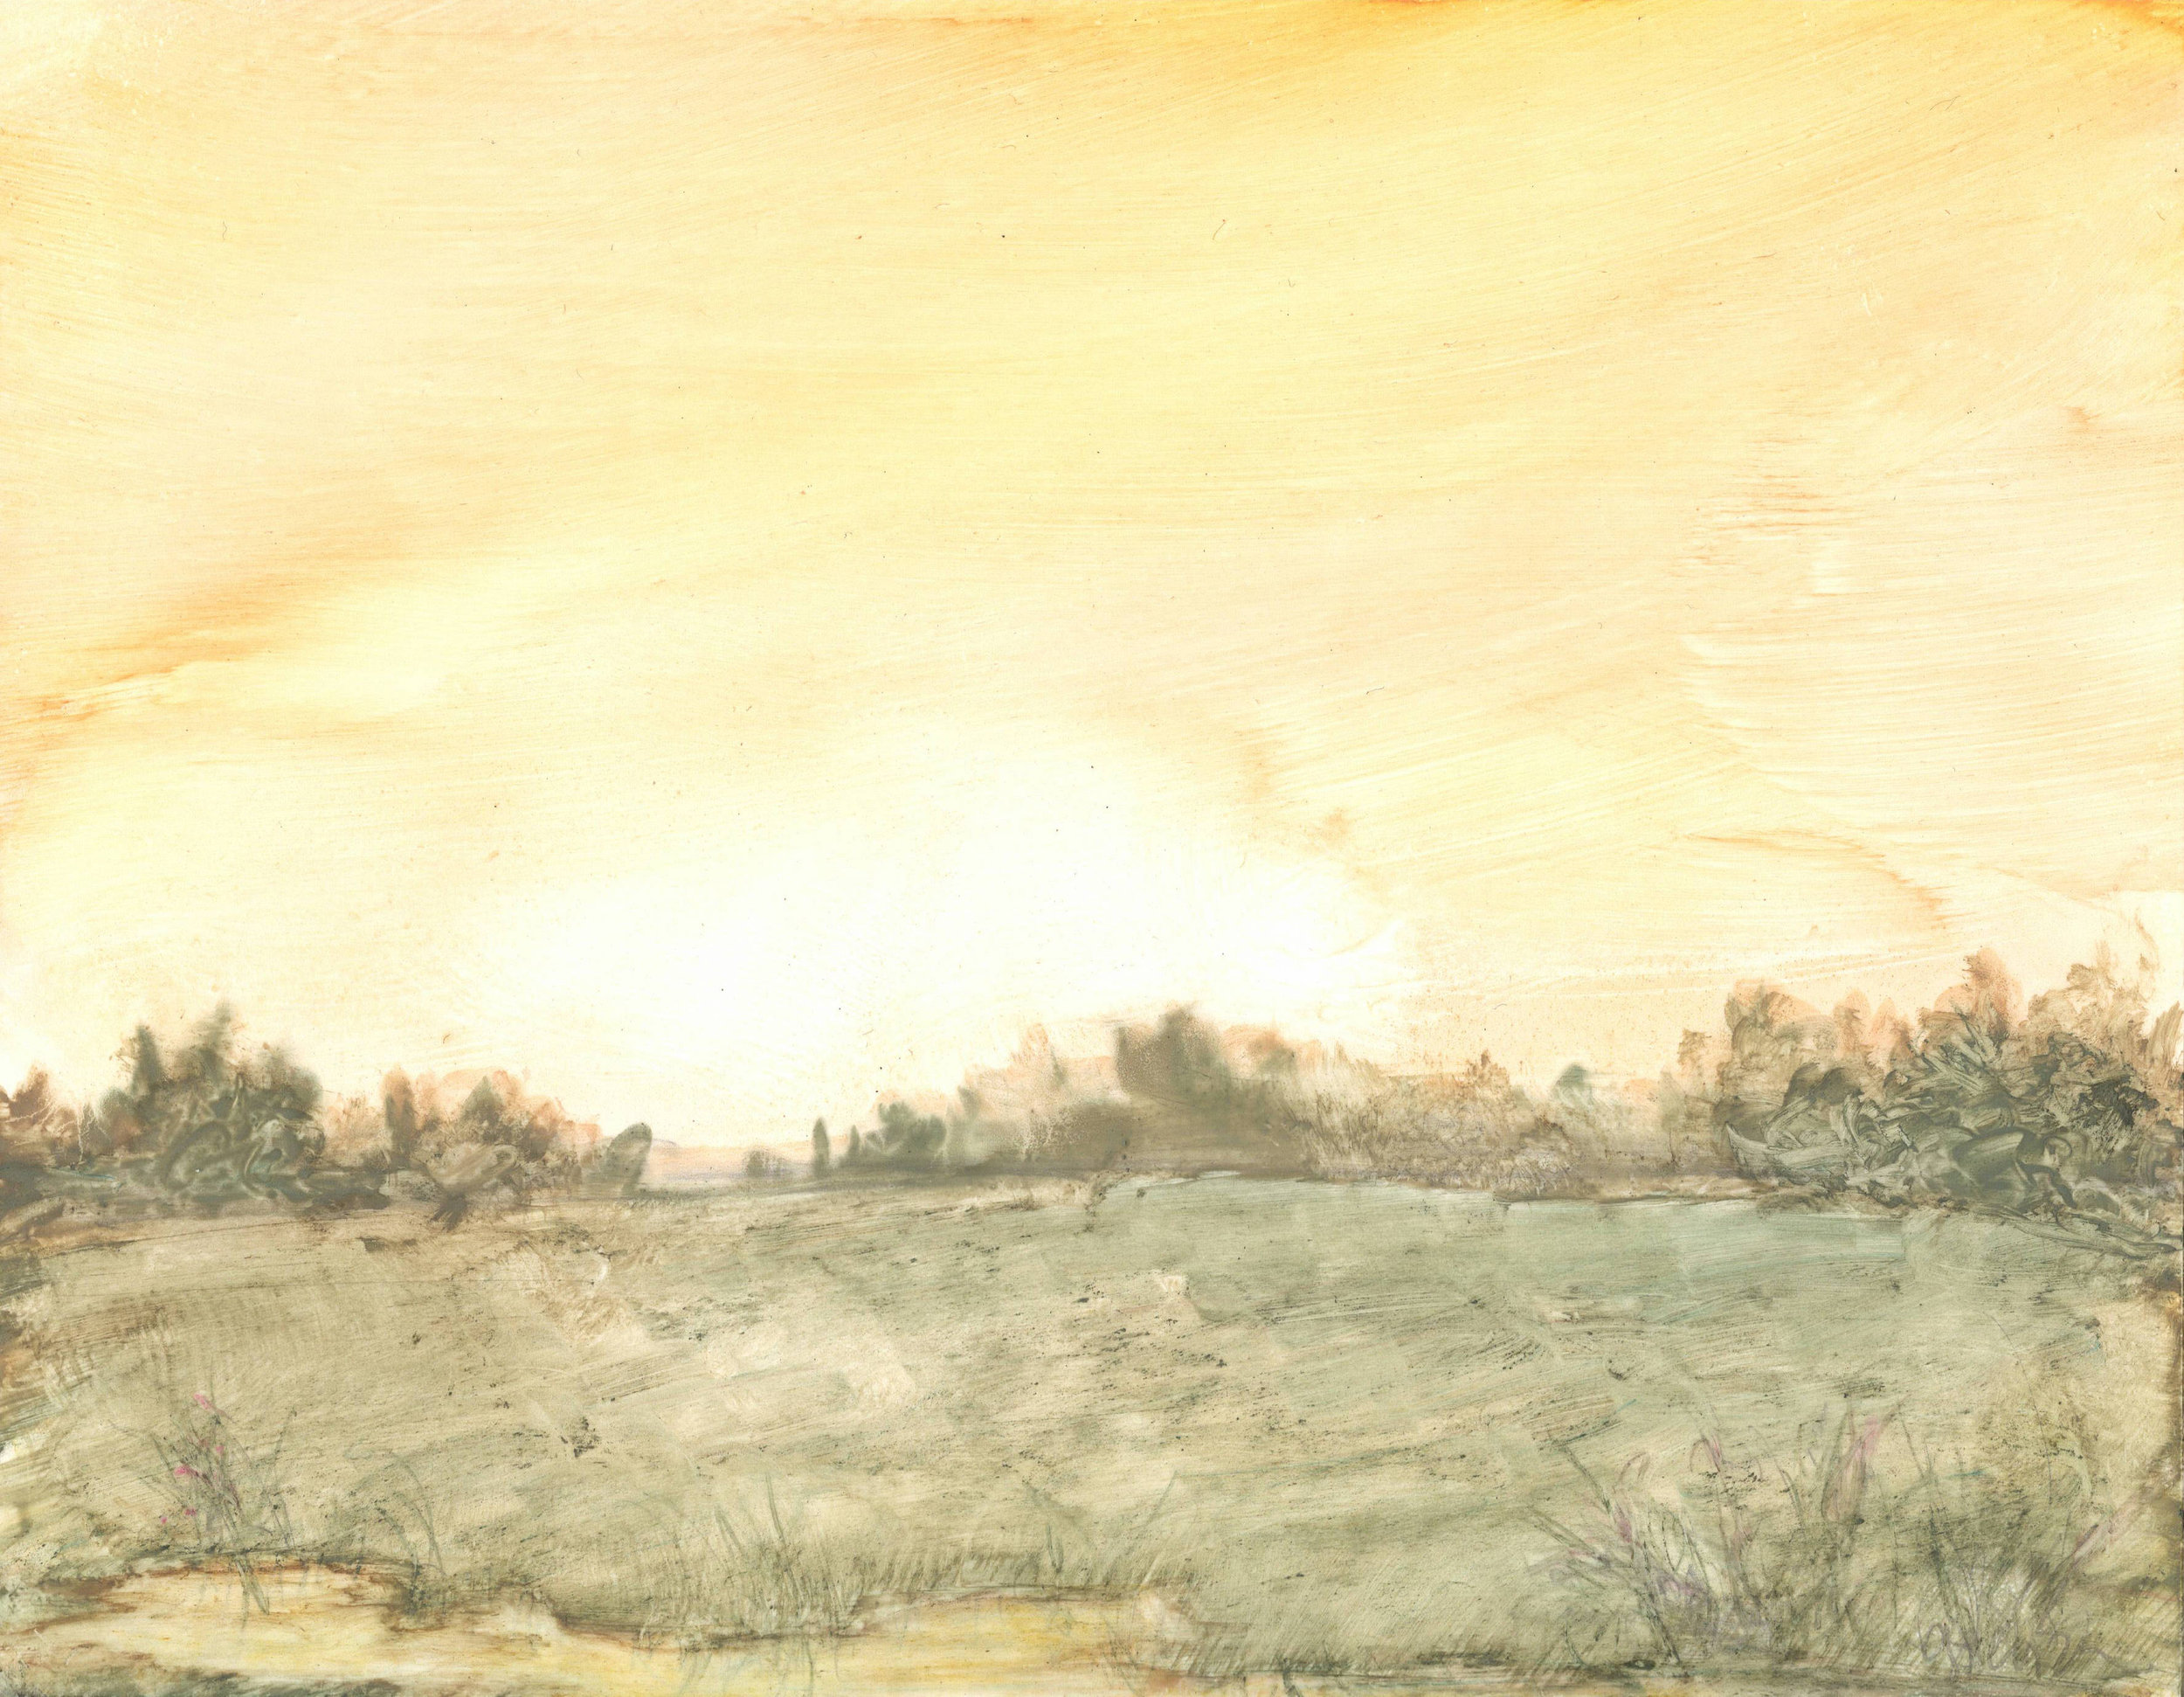 New Dawn New Day © Gabrielle Senza, 2019, watercolor, 4 1/2 x 6 inches